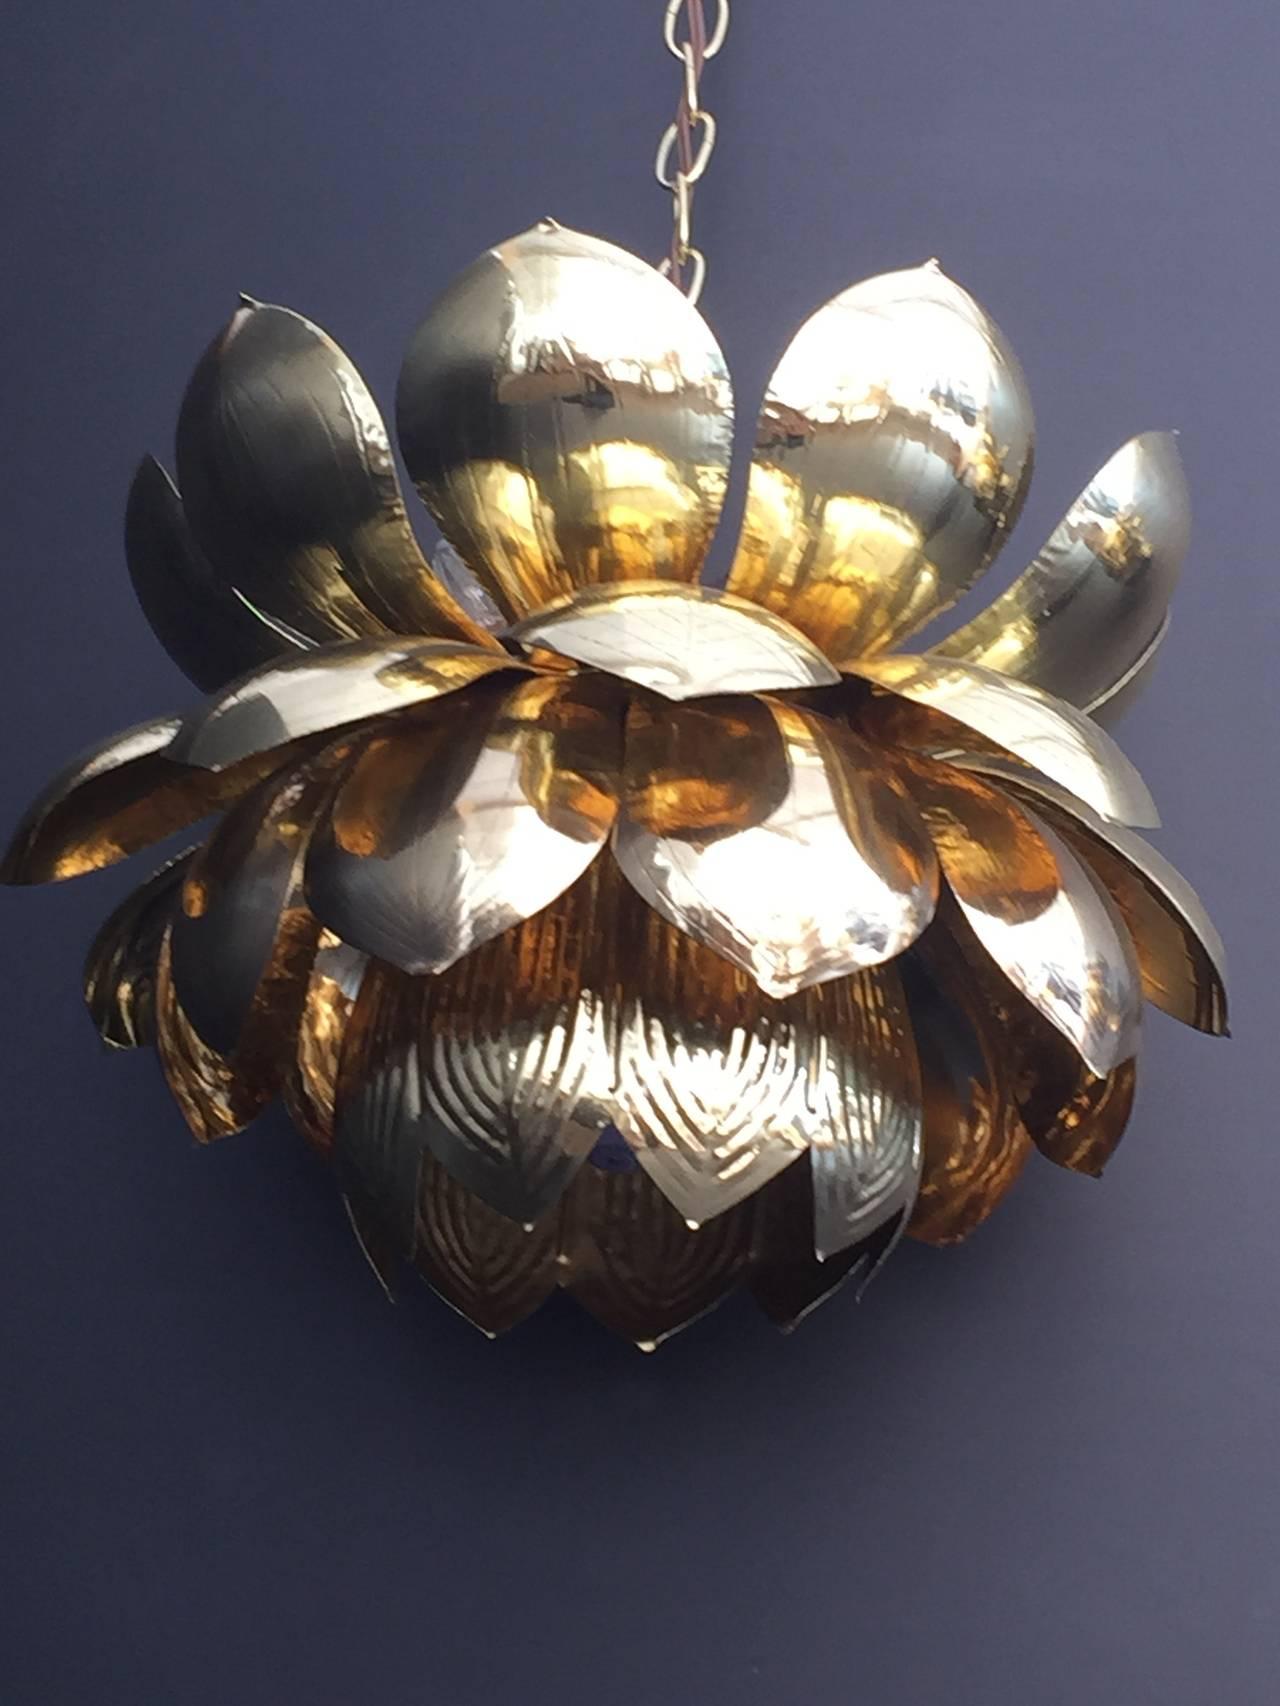 Large brass lotus pendant light by Feldman.